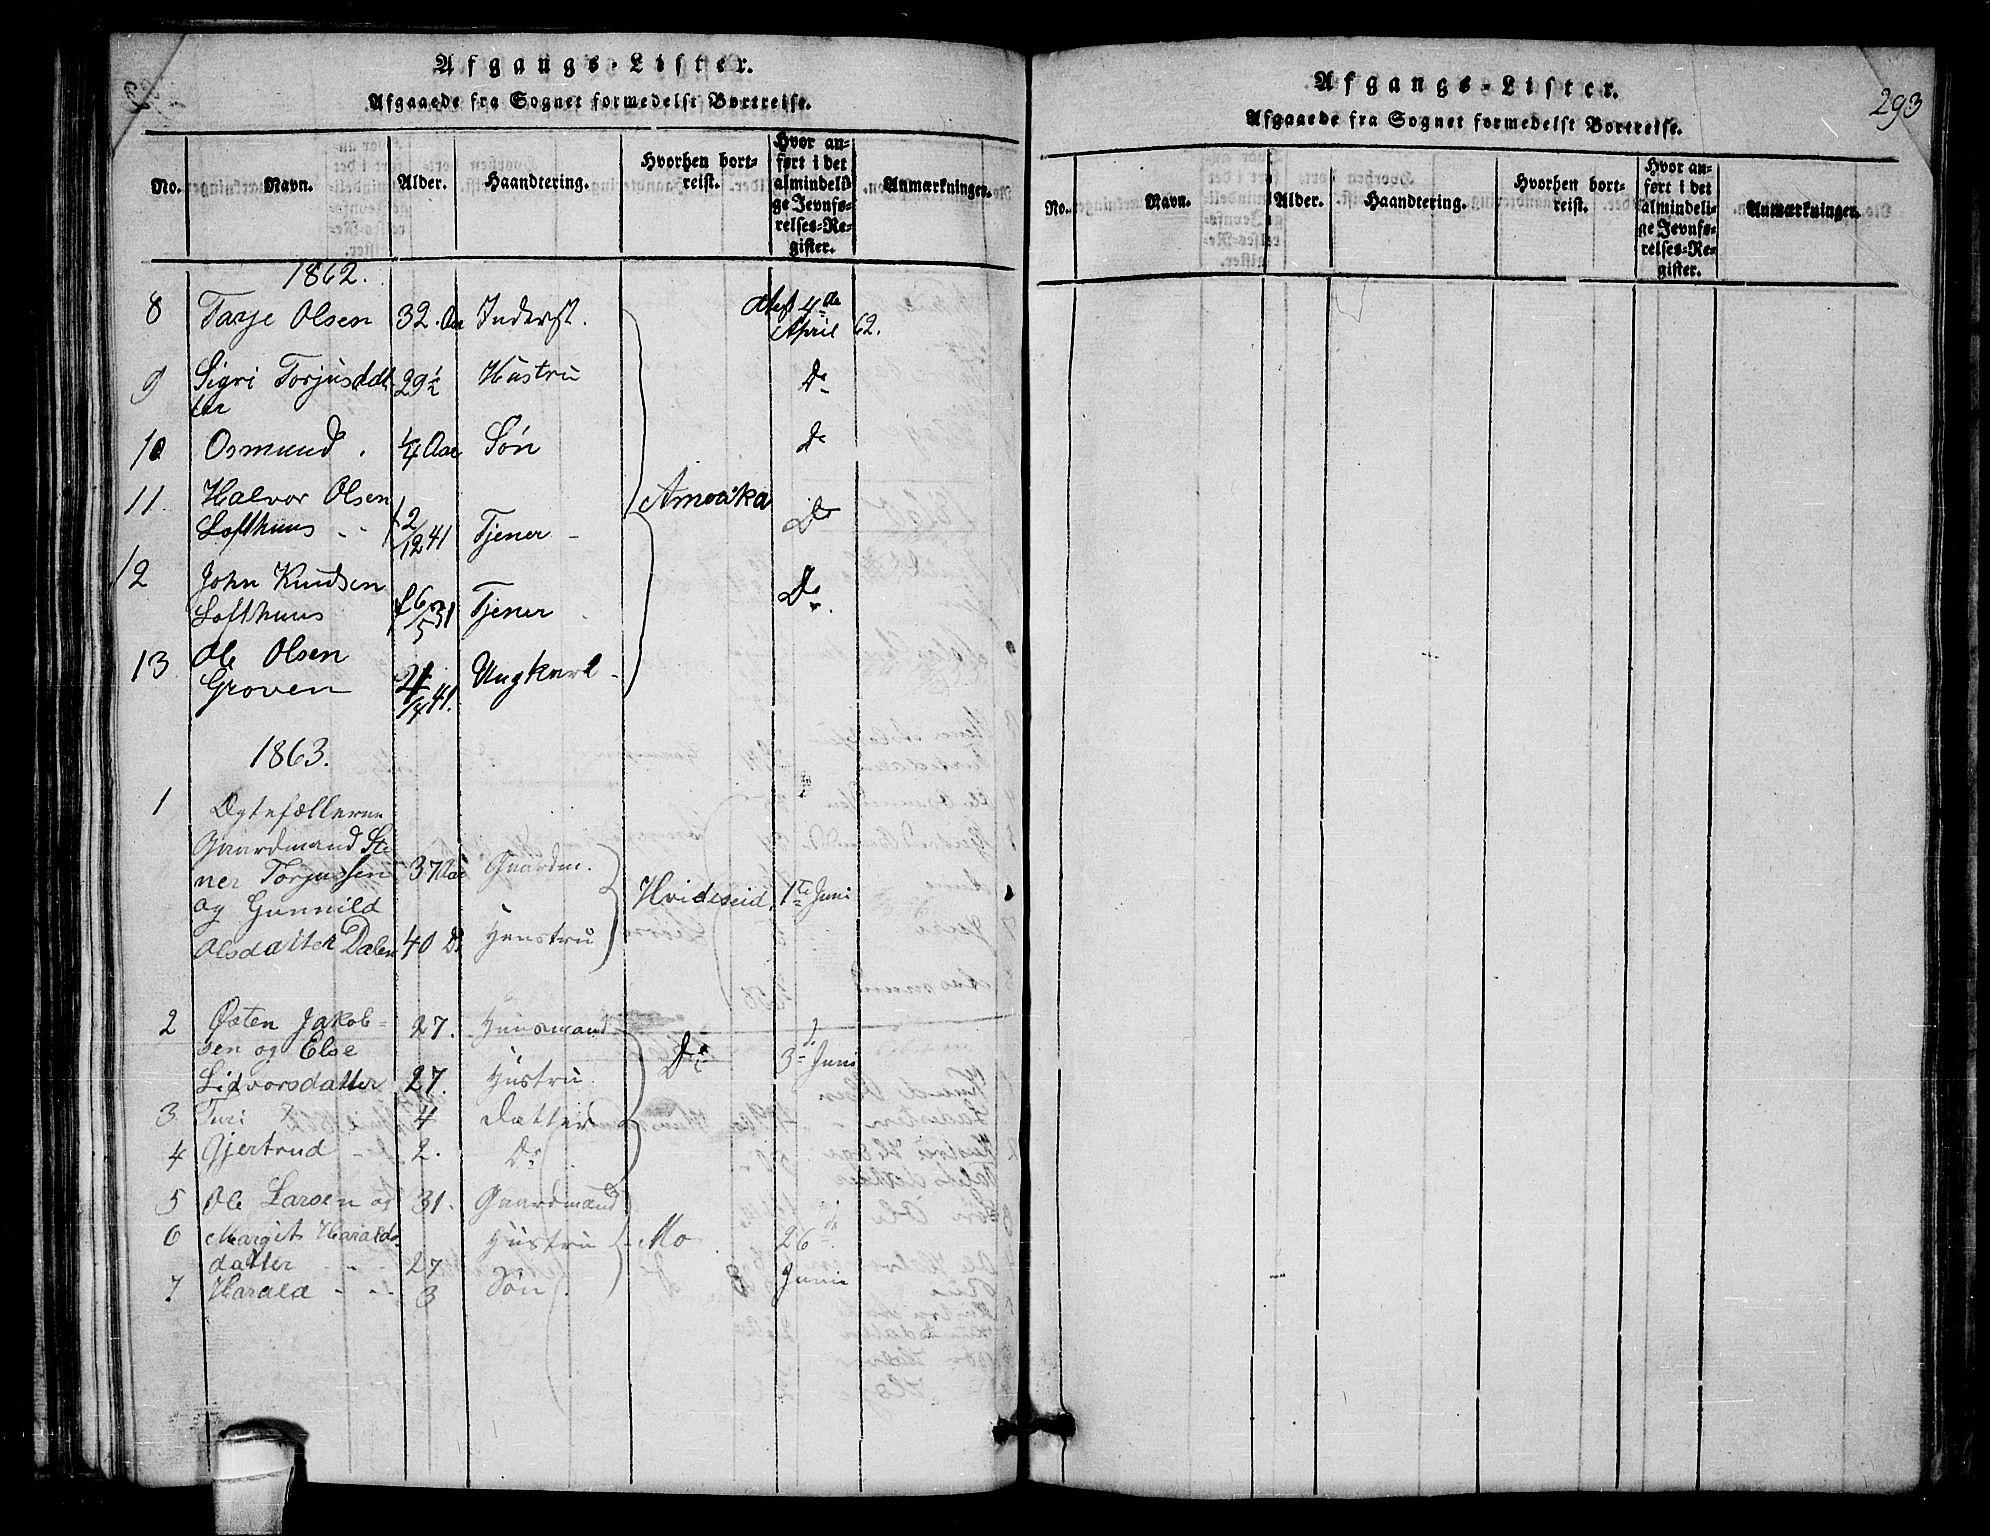 SAKO, Lårdal kirkebøker, G/Gb/L0001: Klokkerbok nr. II 1, 1815-1865, s. 293